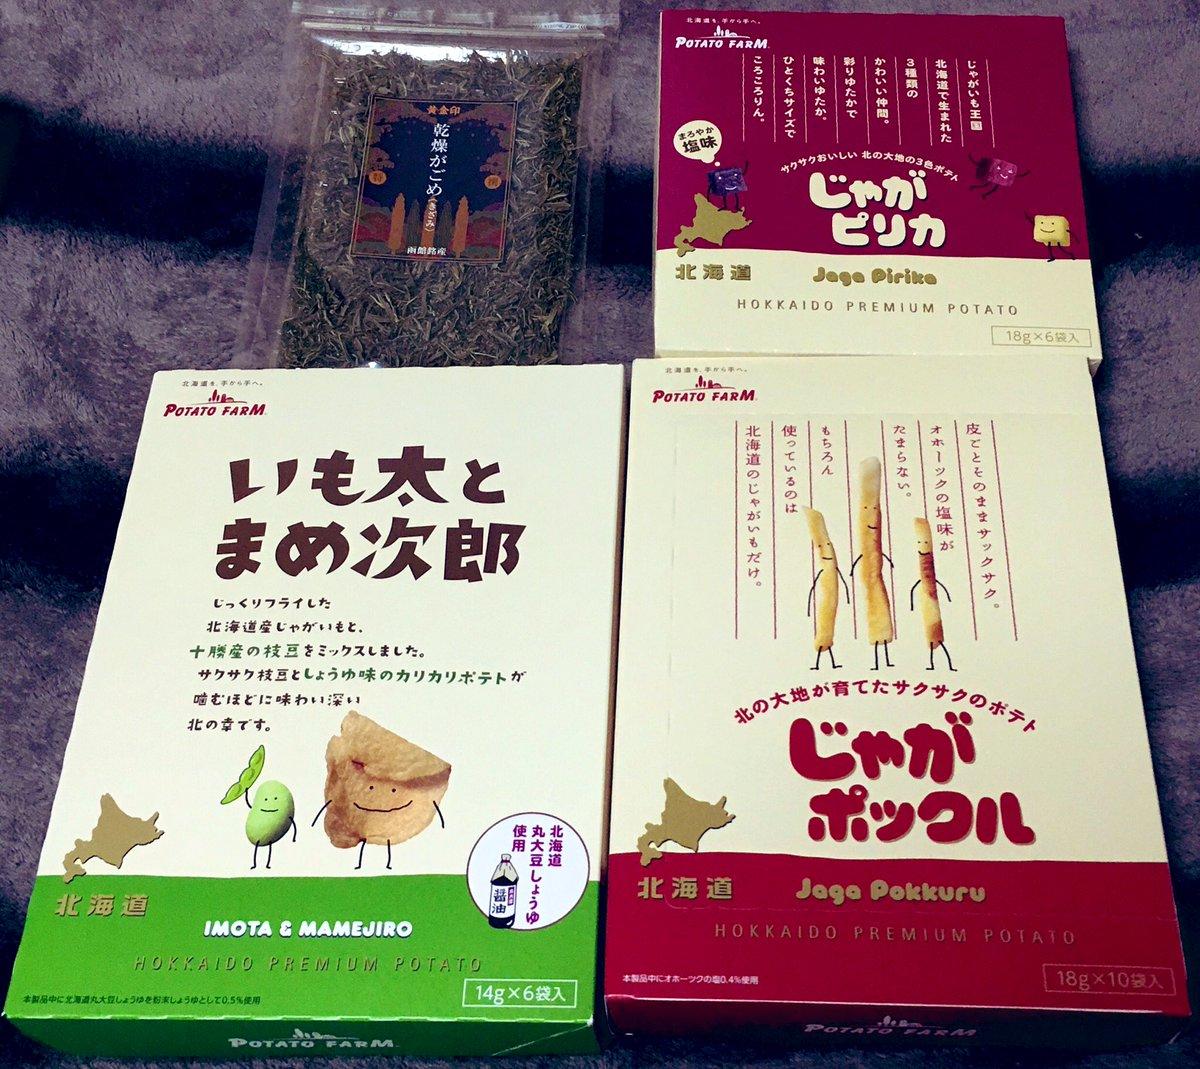 test ツイッターメディア - 北海道 お土産貰たで‼︎😆😆 じゃがポックル 美味いんよね😋 https://t.co/CH6o5xXvzT